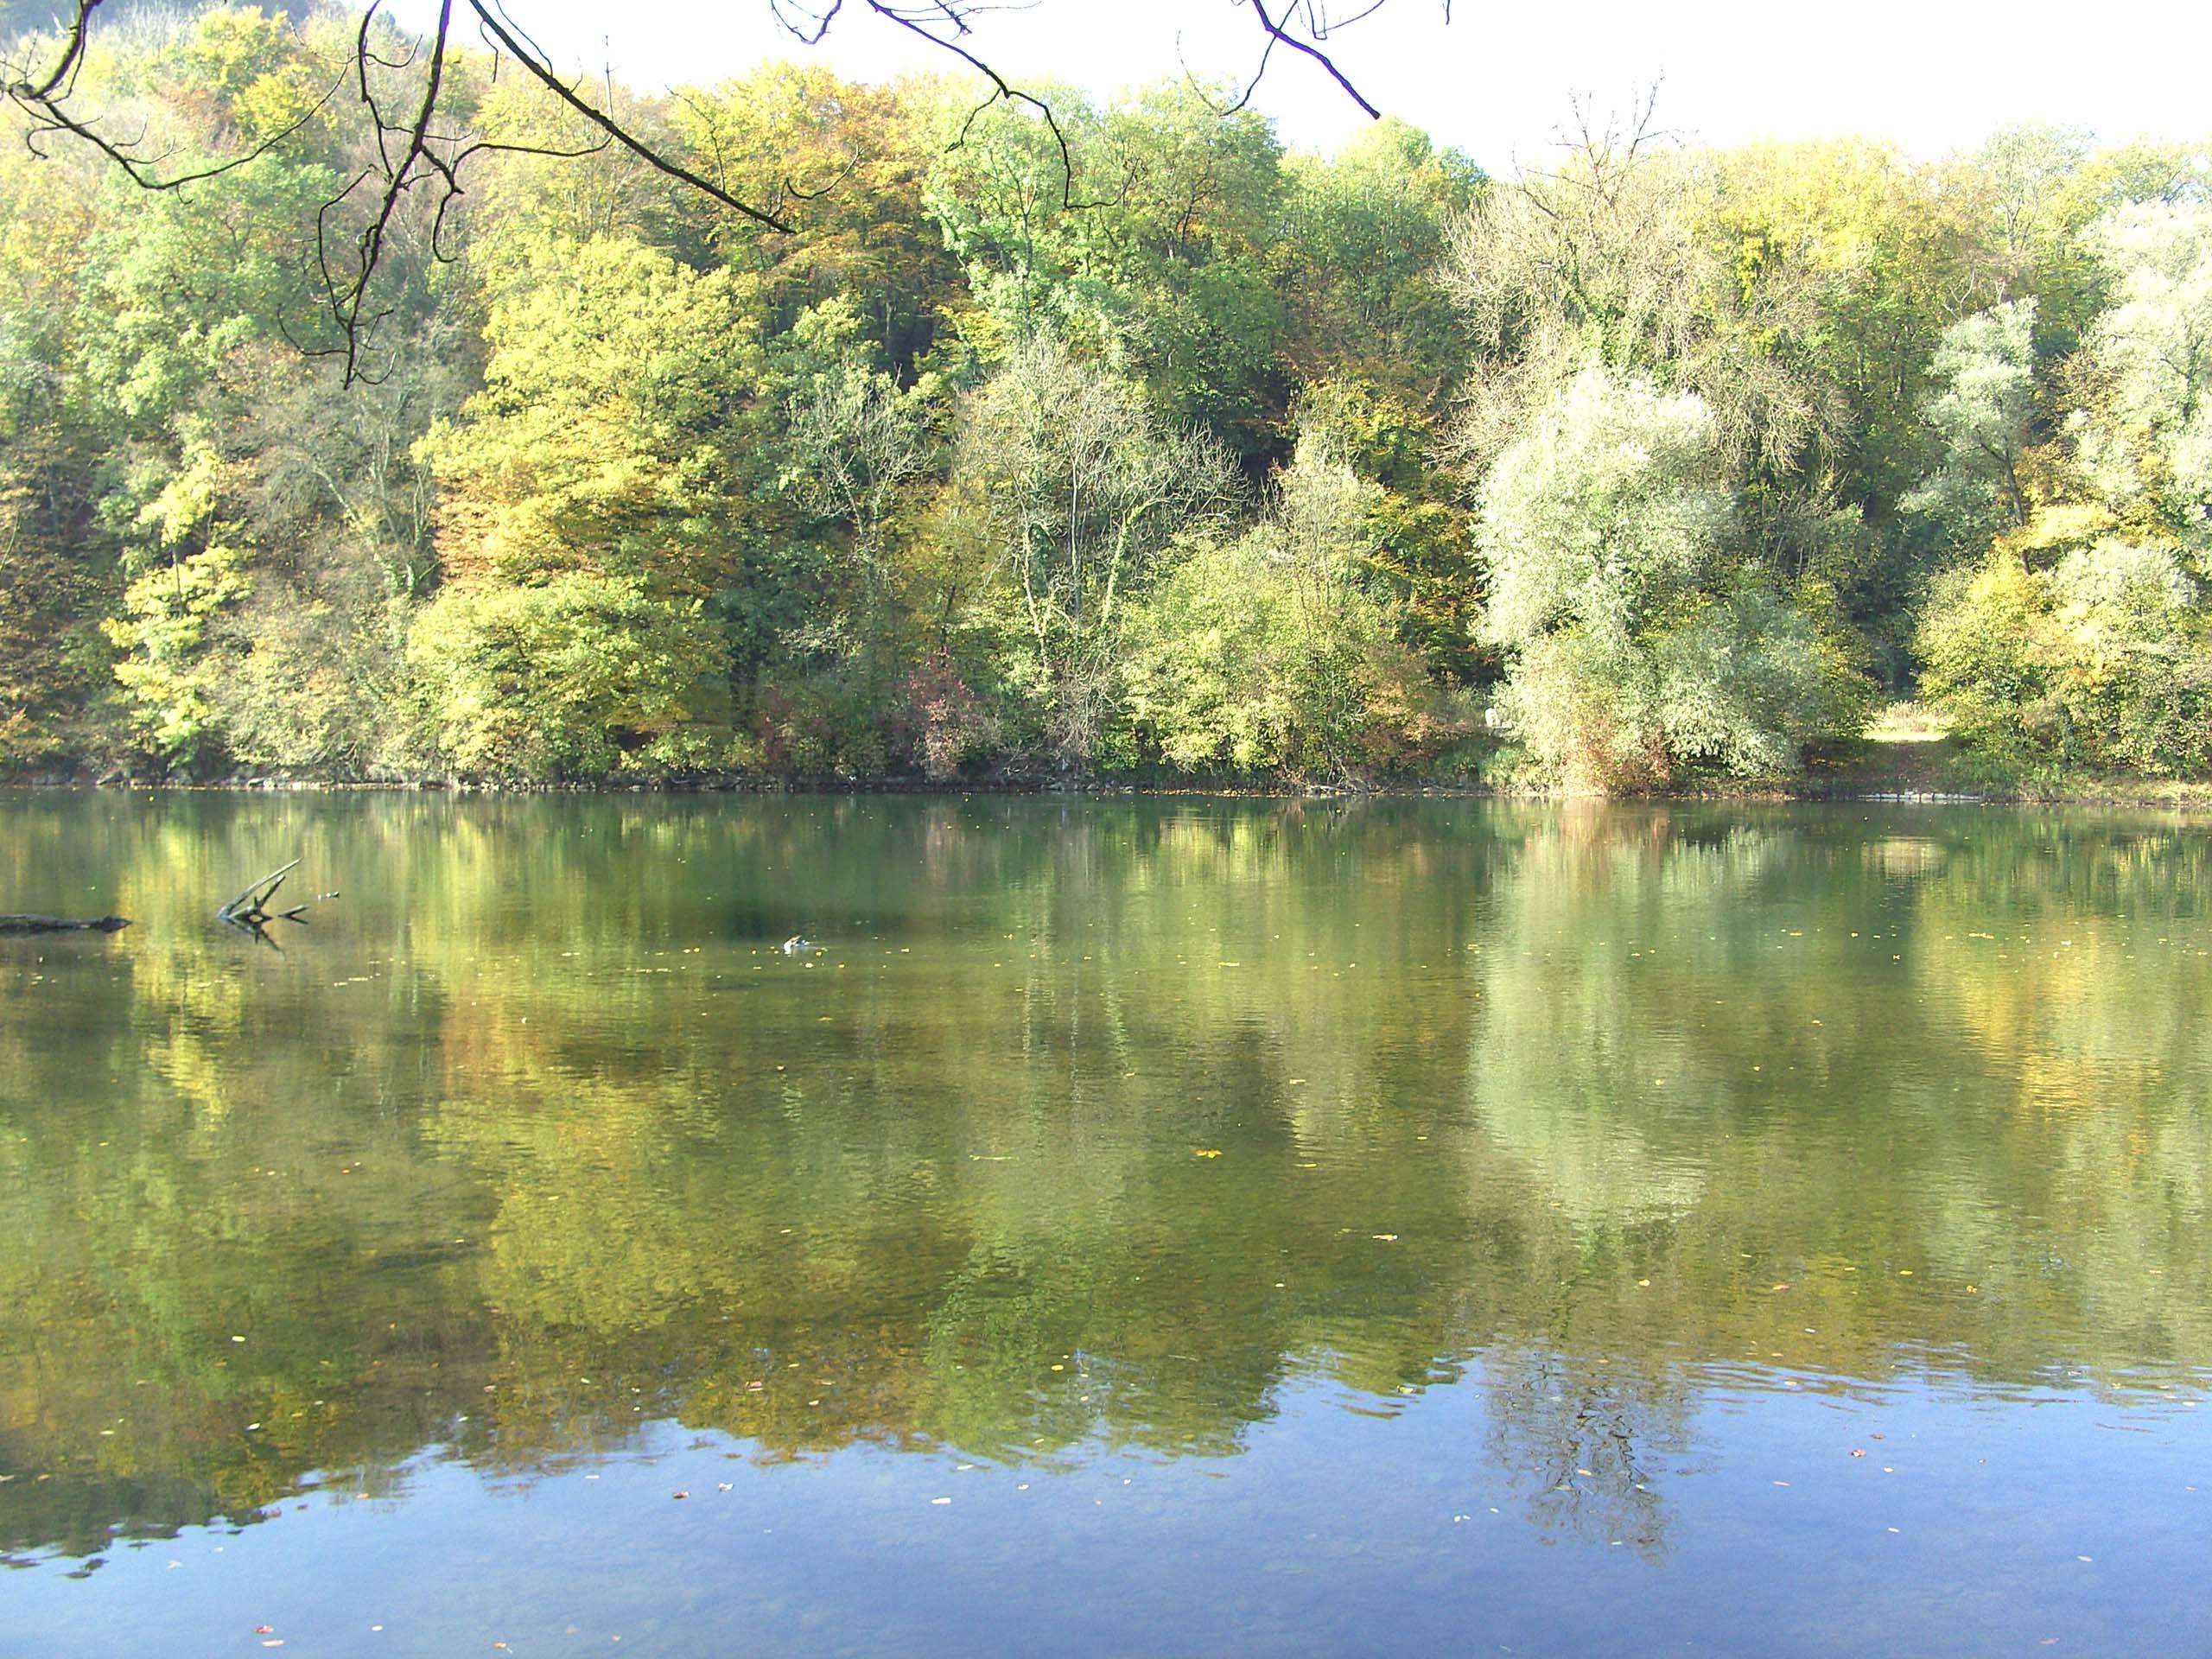 DARSHAN mit GOTT: Aare-Flusslandschaft bei Aarau, Desktopbild